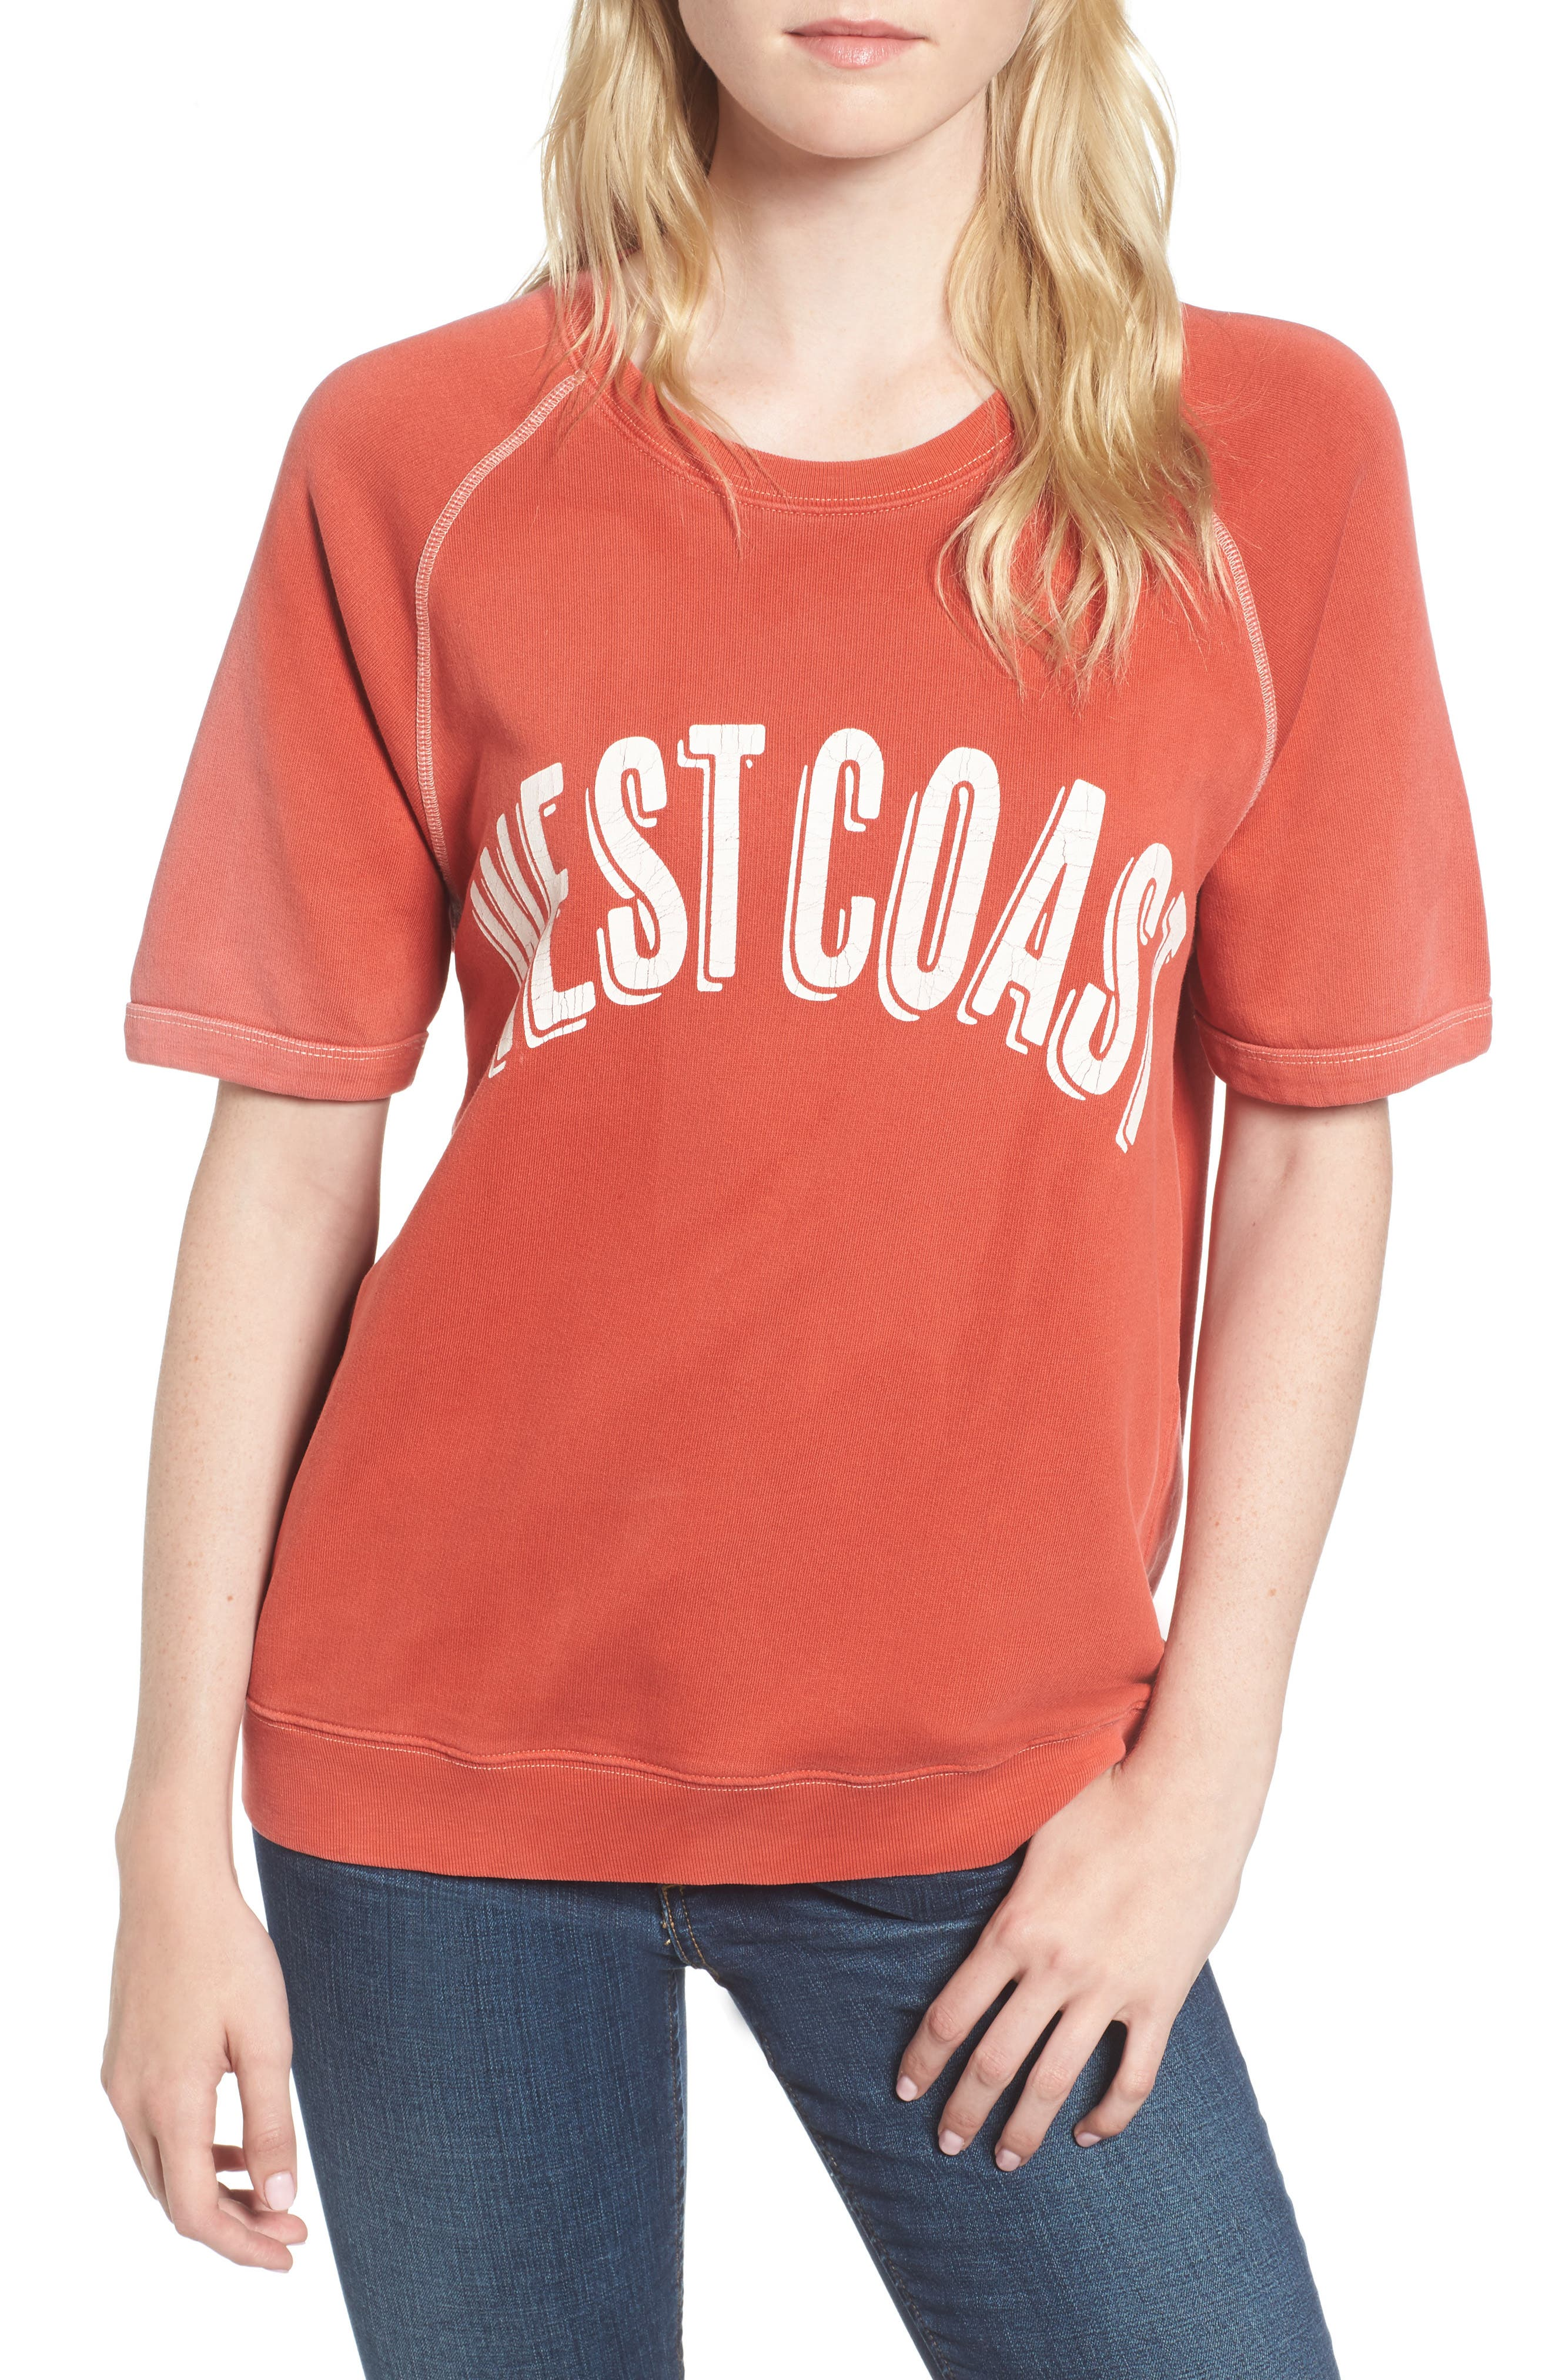 Alternate Image 1 Selected - Sincerely Jules West Coast Sweatshirt